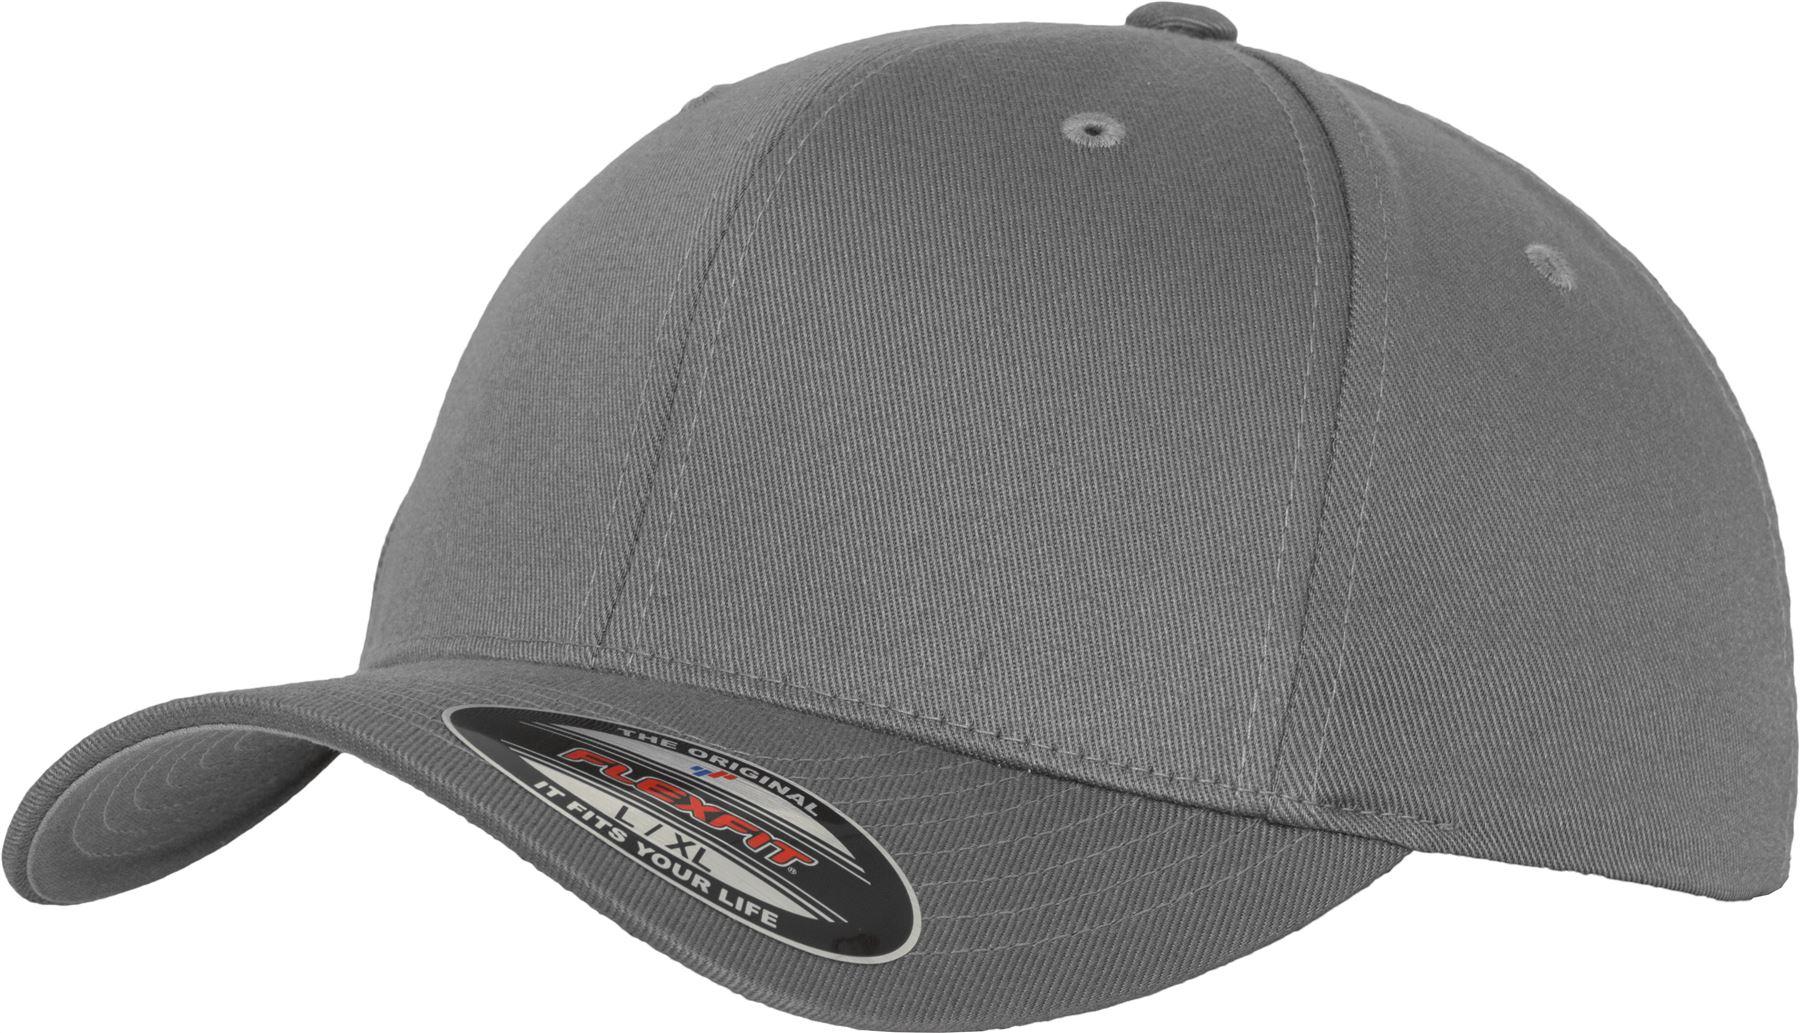 flexfit by yupoong headwear baseball caps flexfit fitted baseball cap ebay. Black Bedroom Furniture Sets. Home Design Ideas